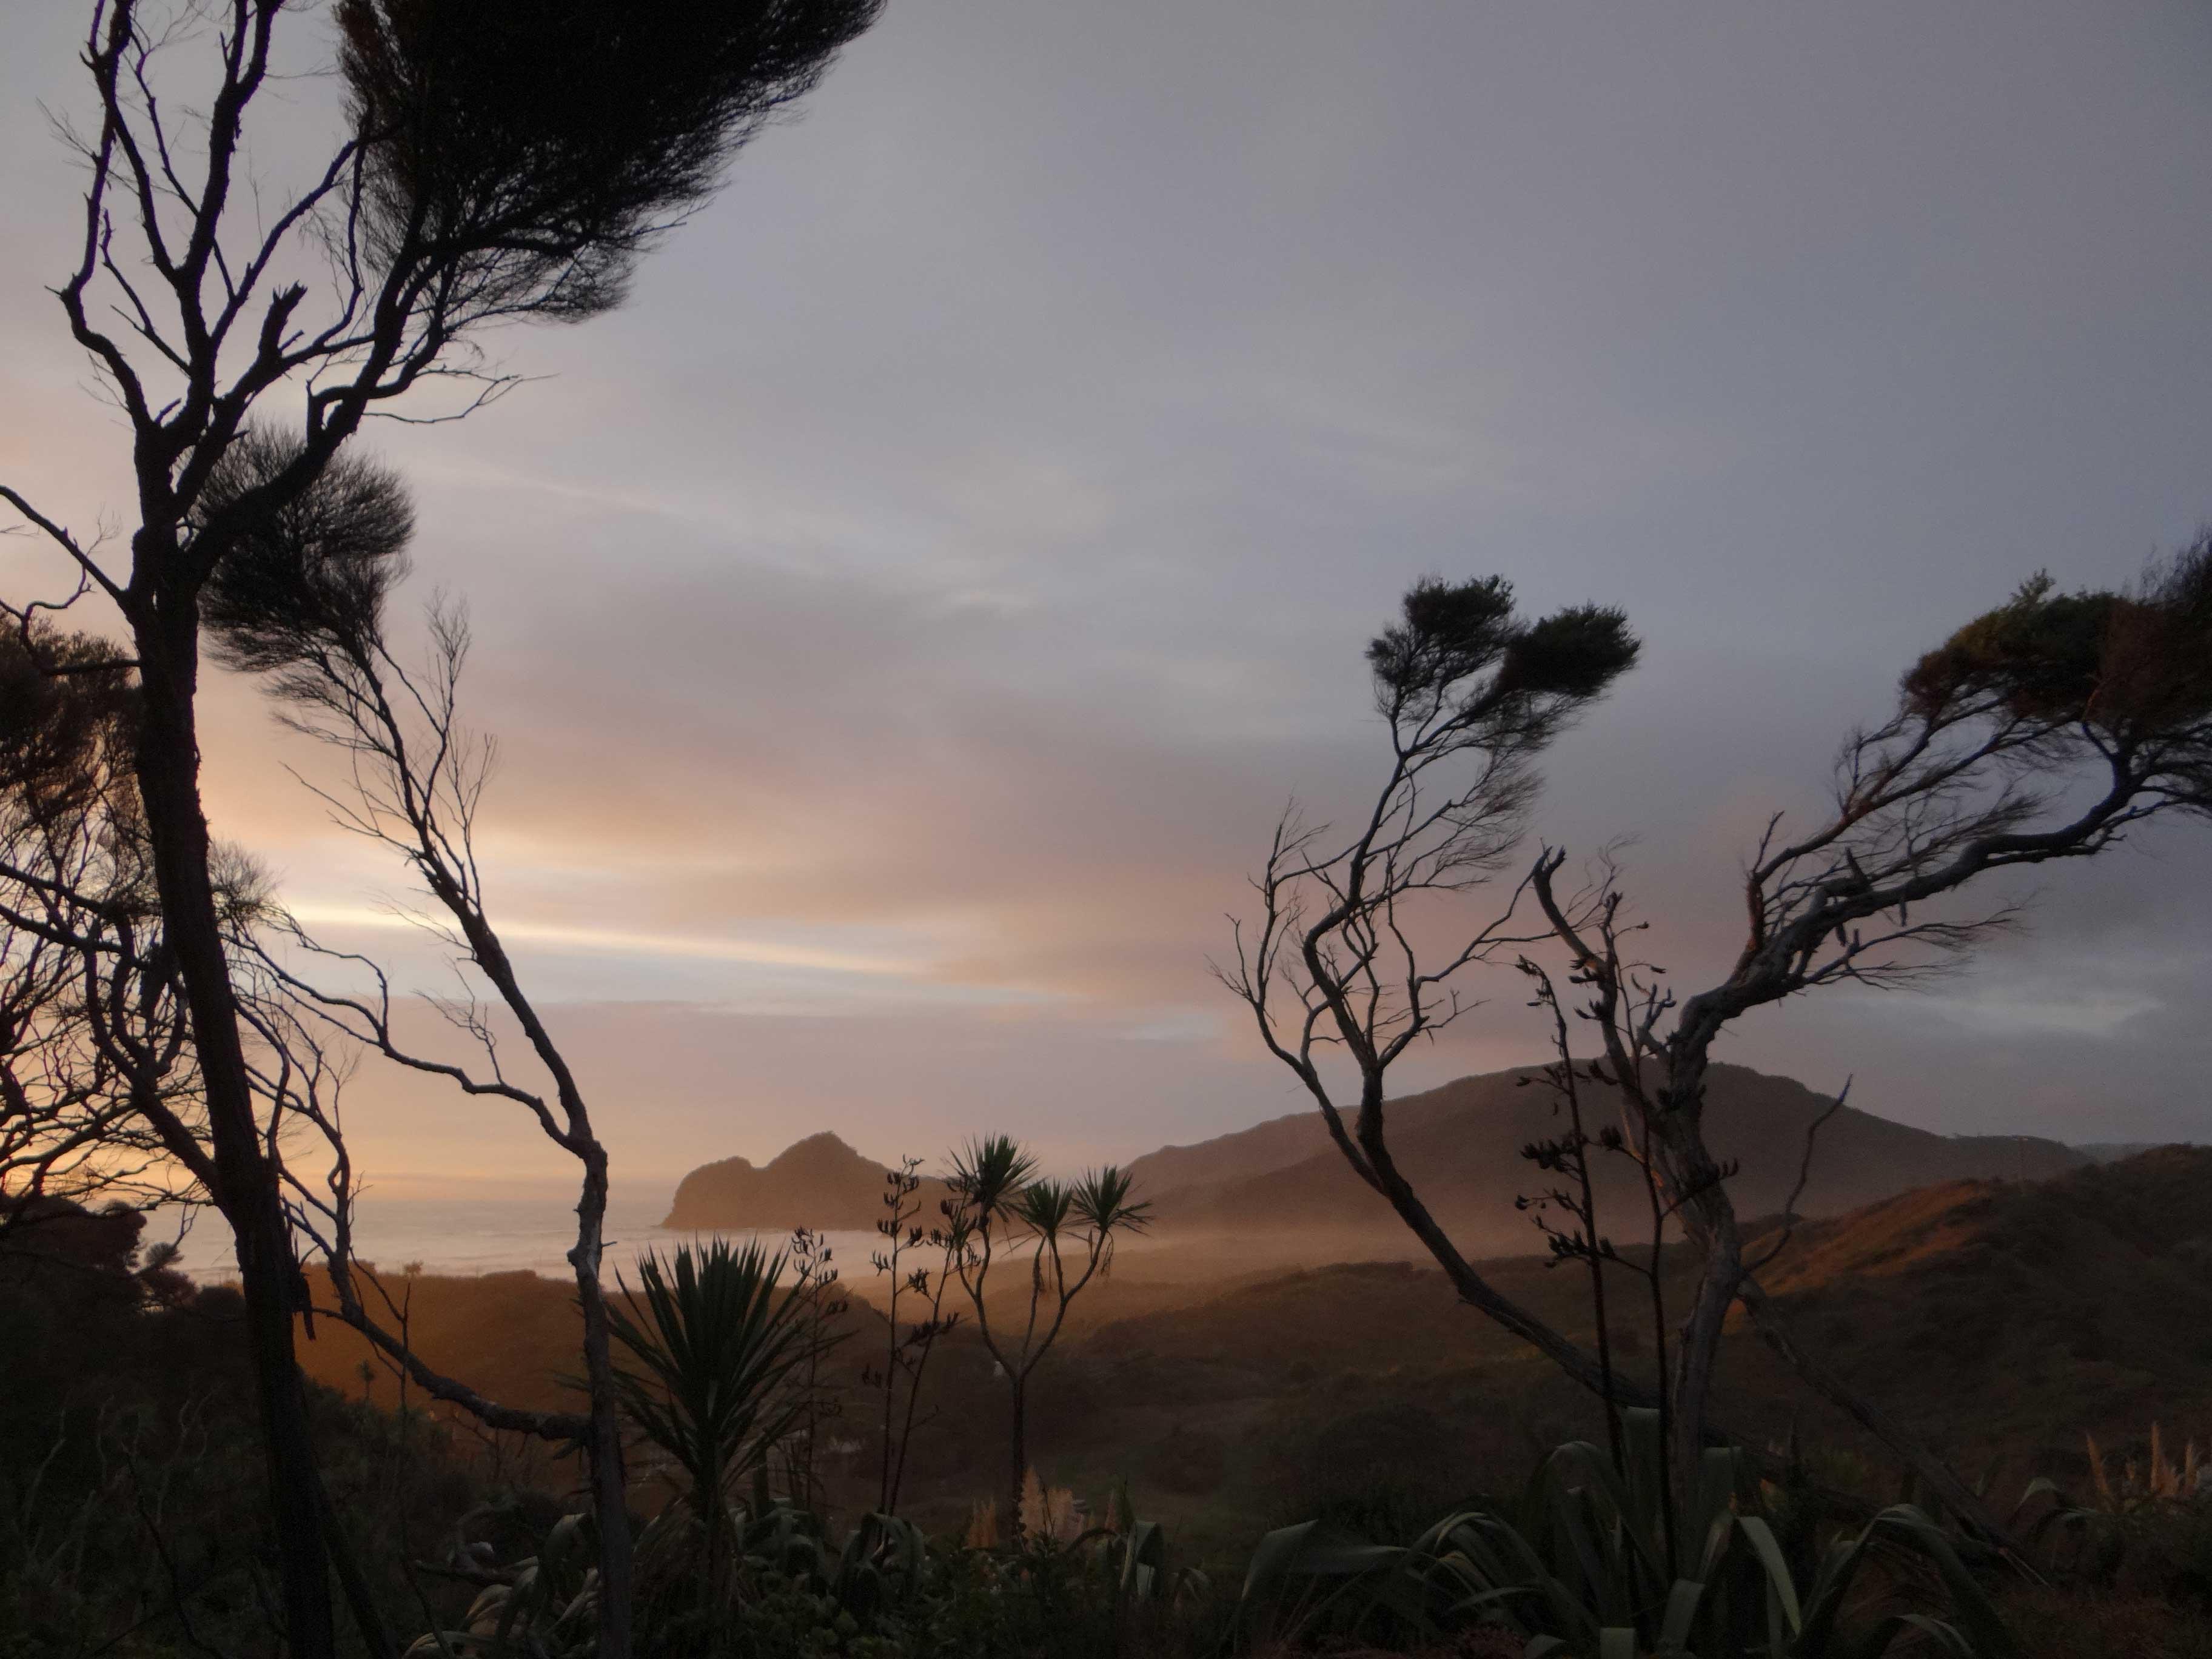 Sunset over Otawewe